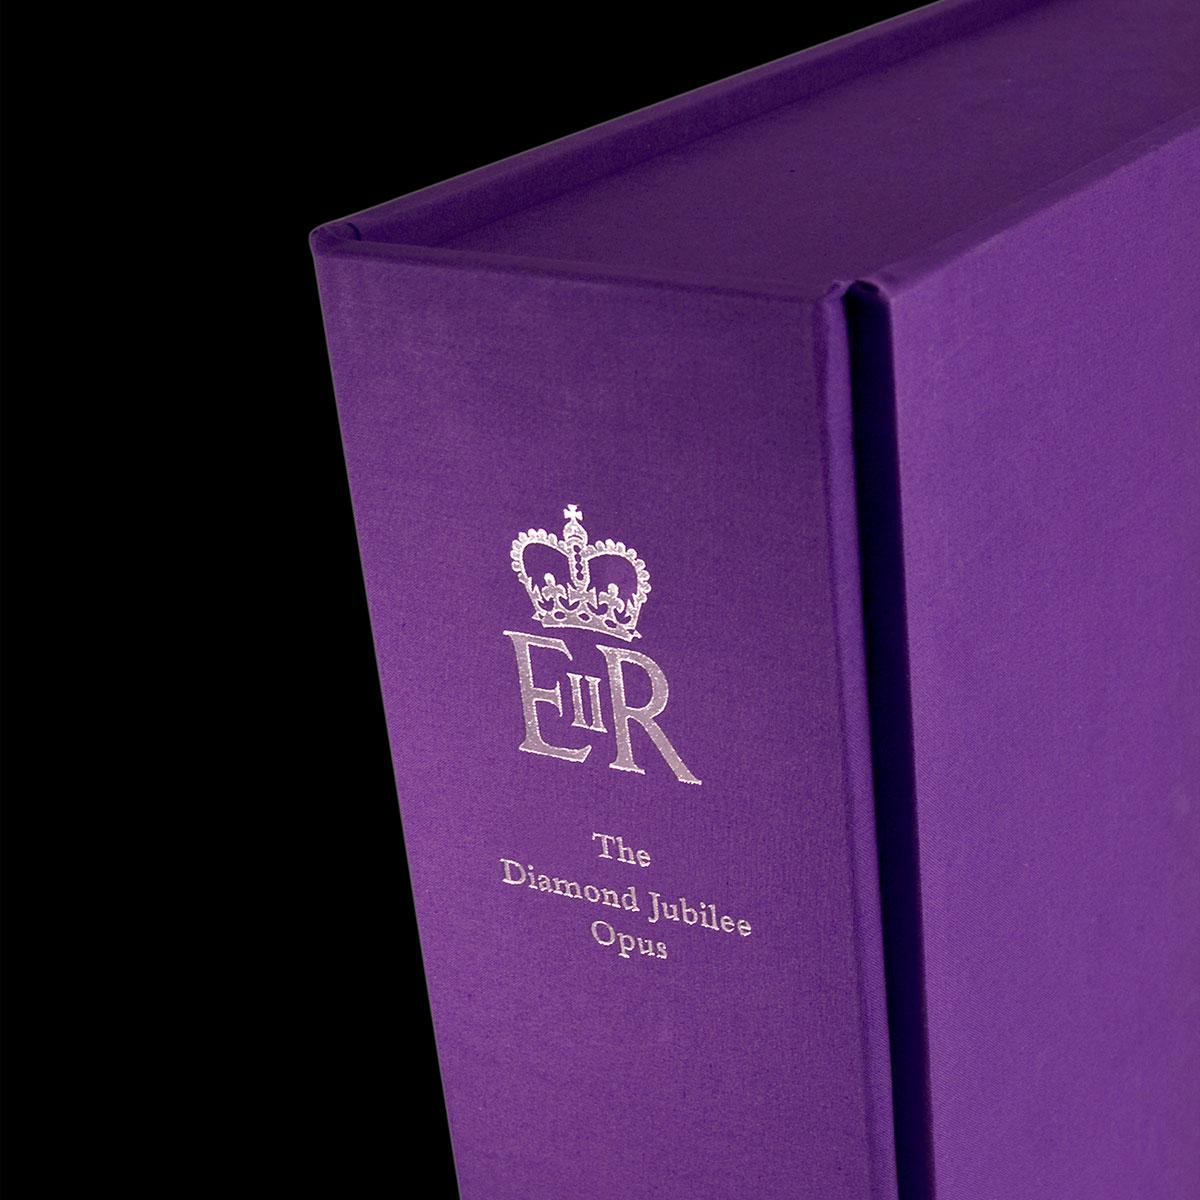 The Diamond Jubilee book design